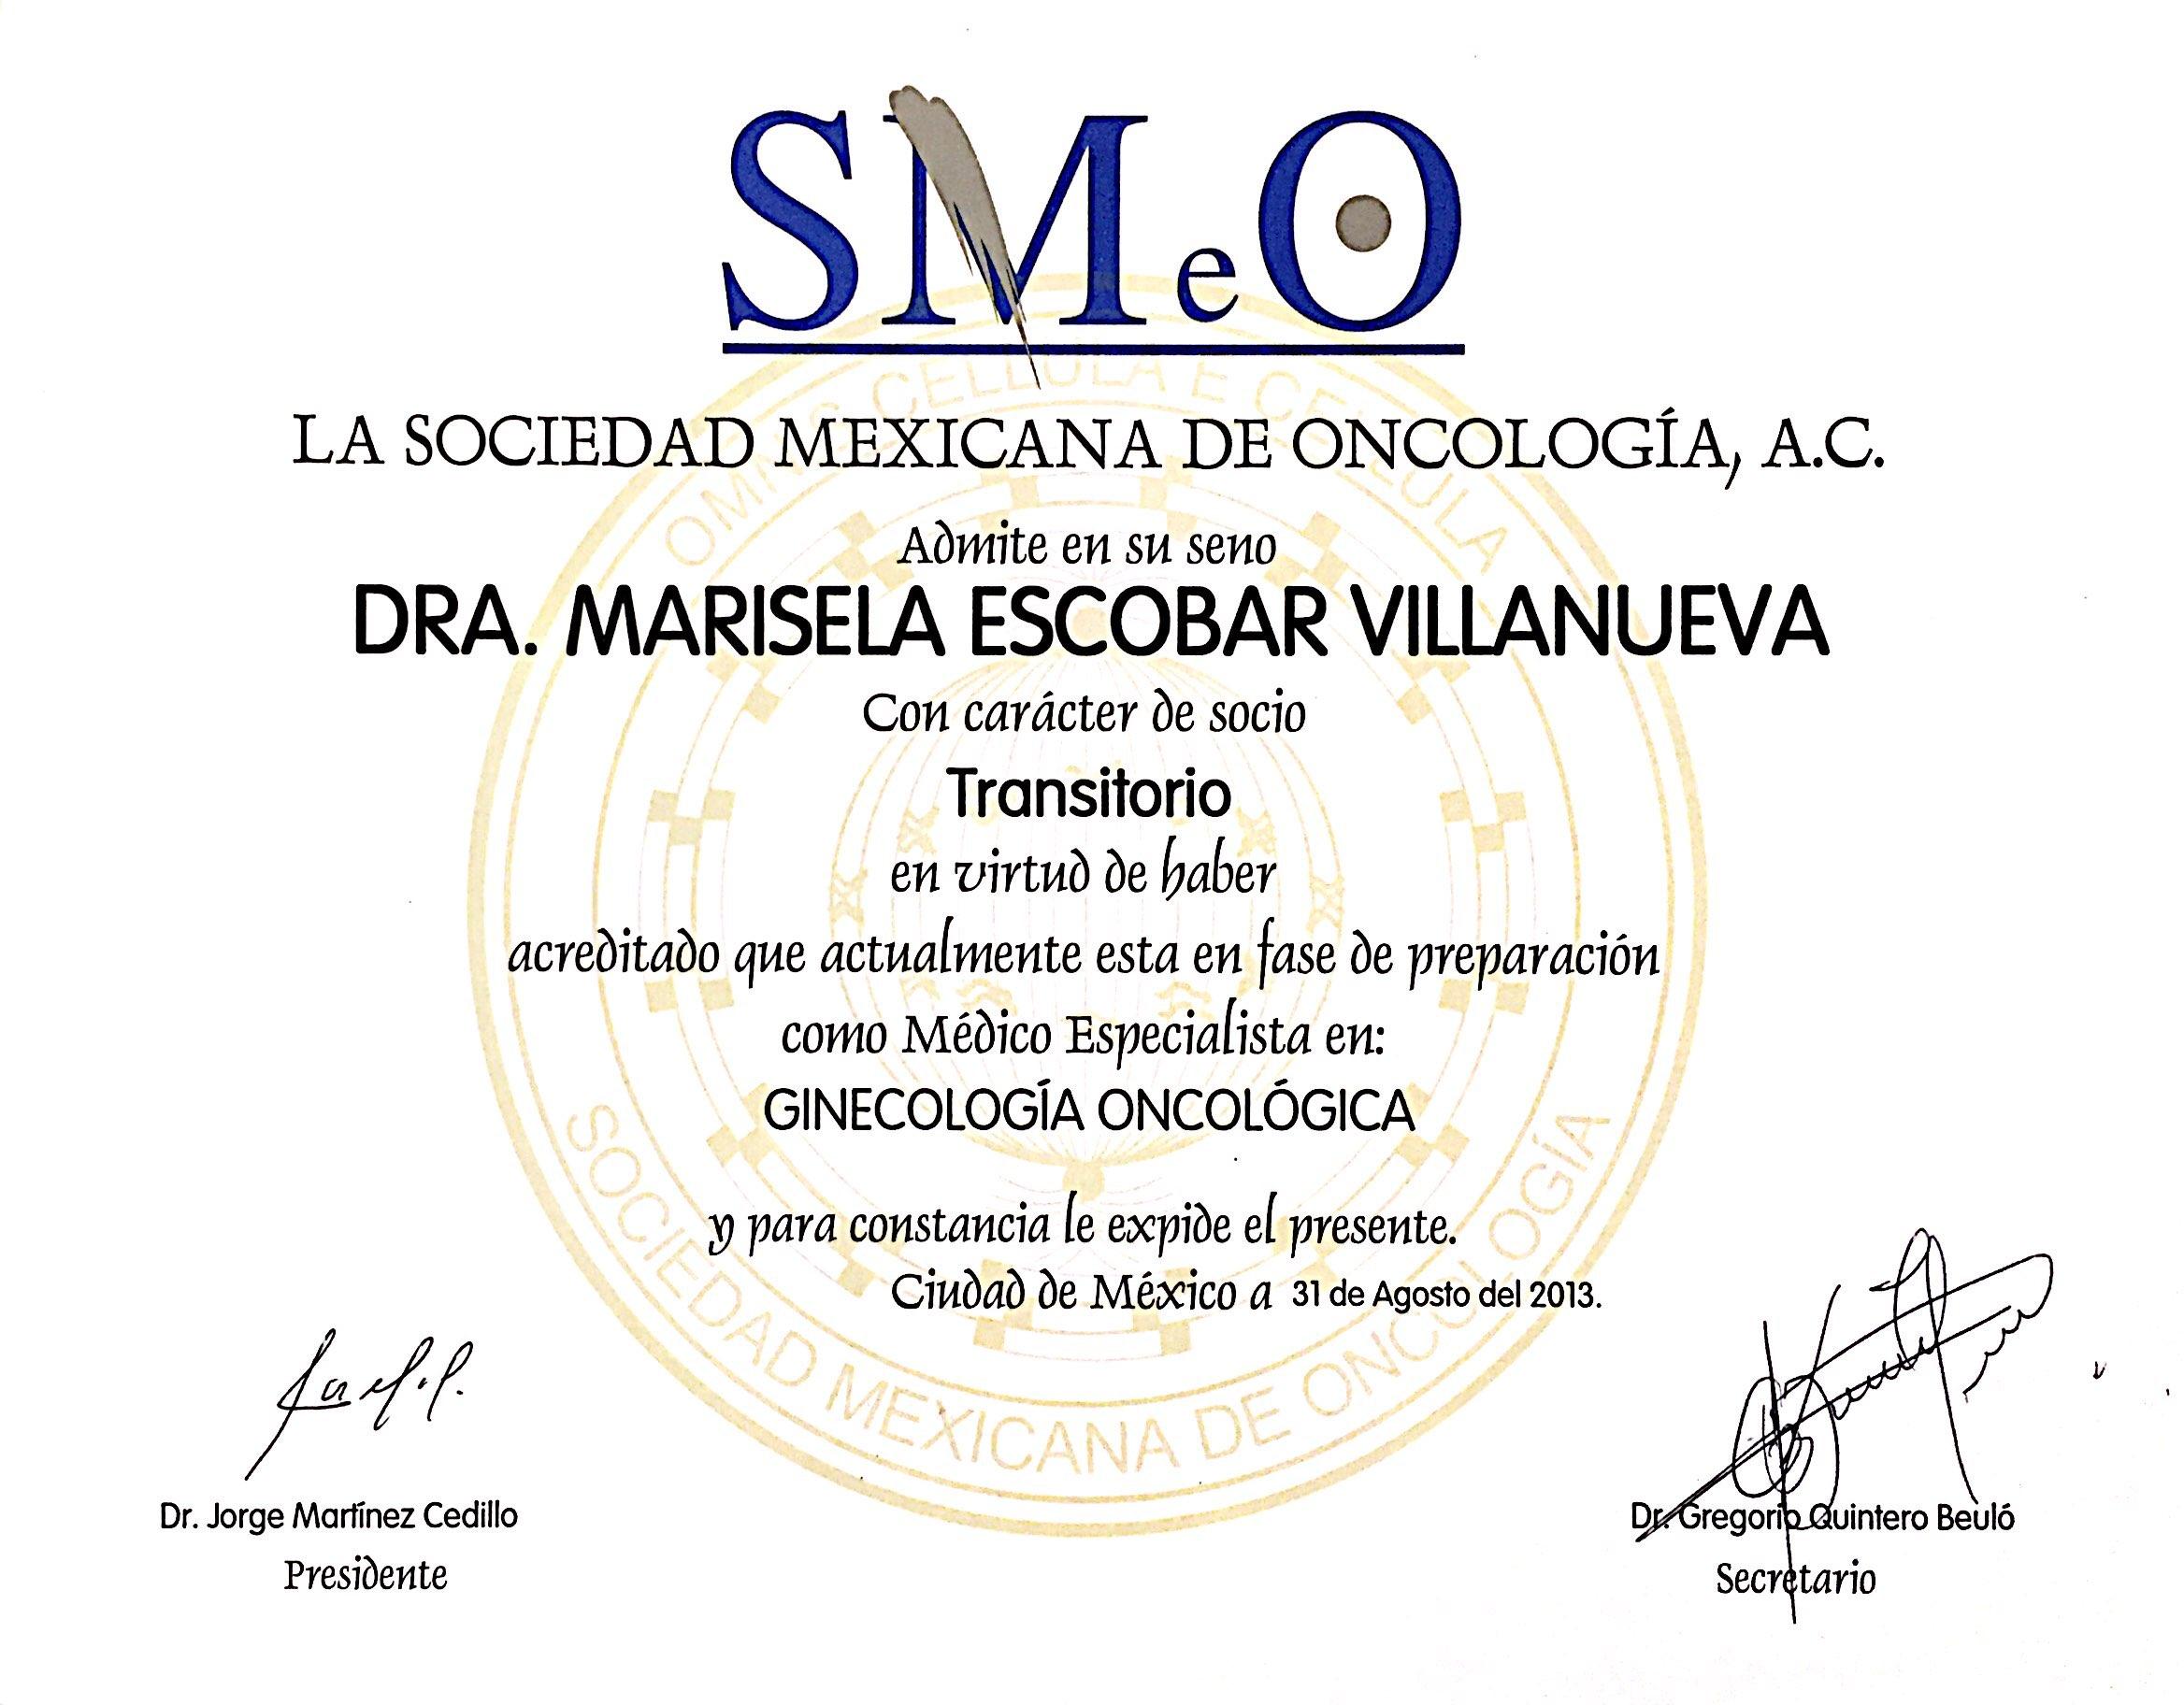 Nuevo doc 2018-02-20 11.21.39_8